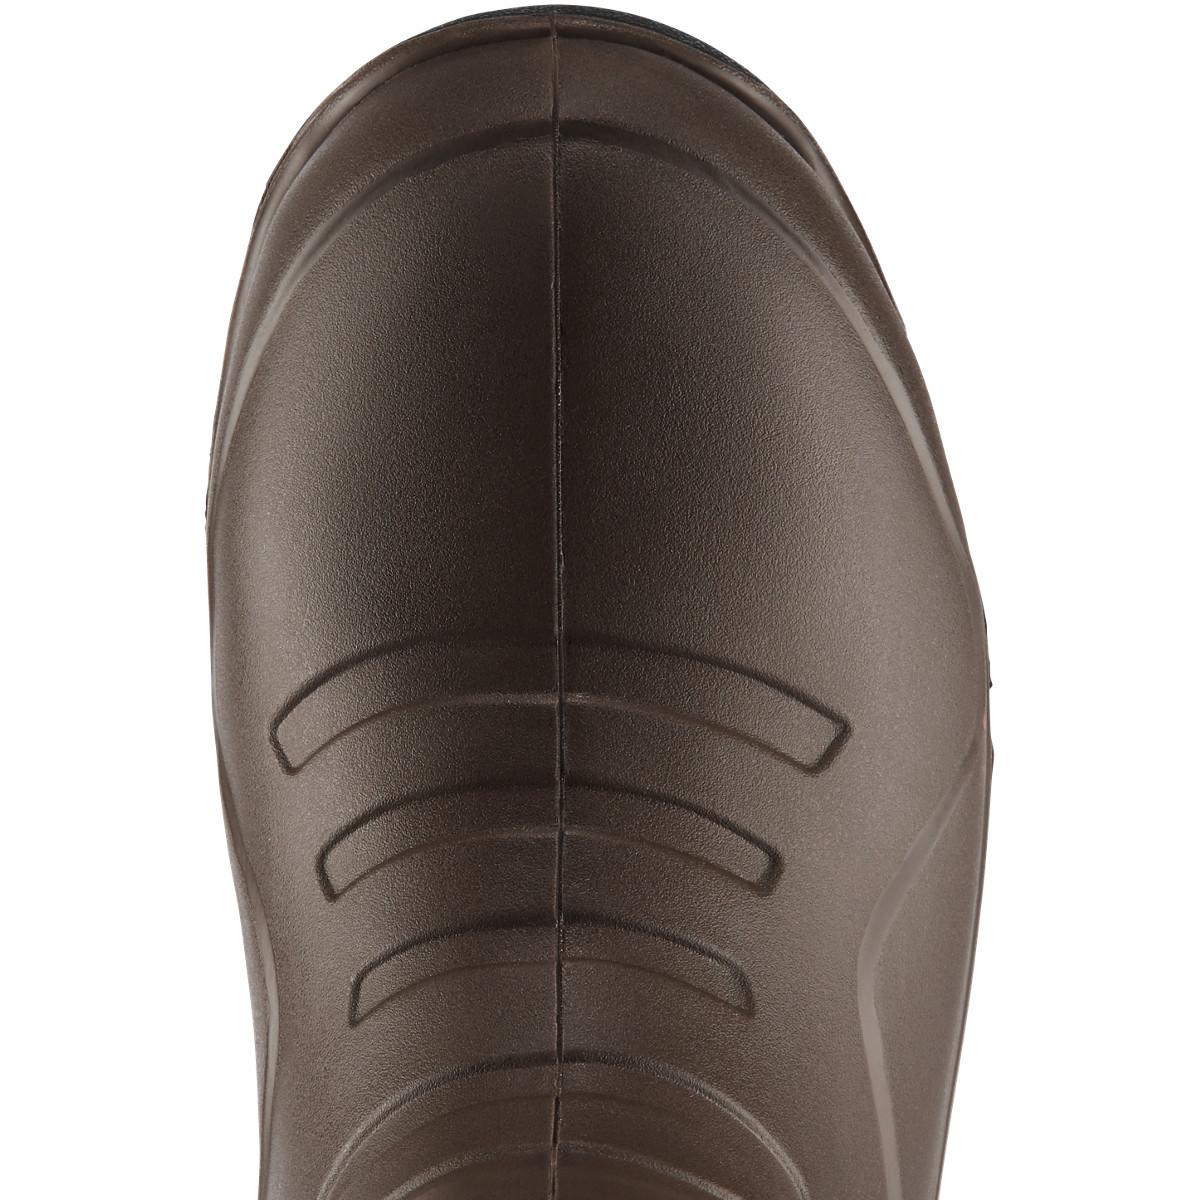 AeroHead Sport Snake Boot 16